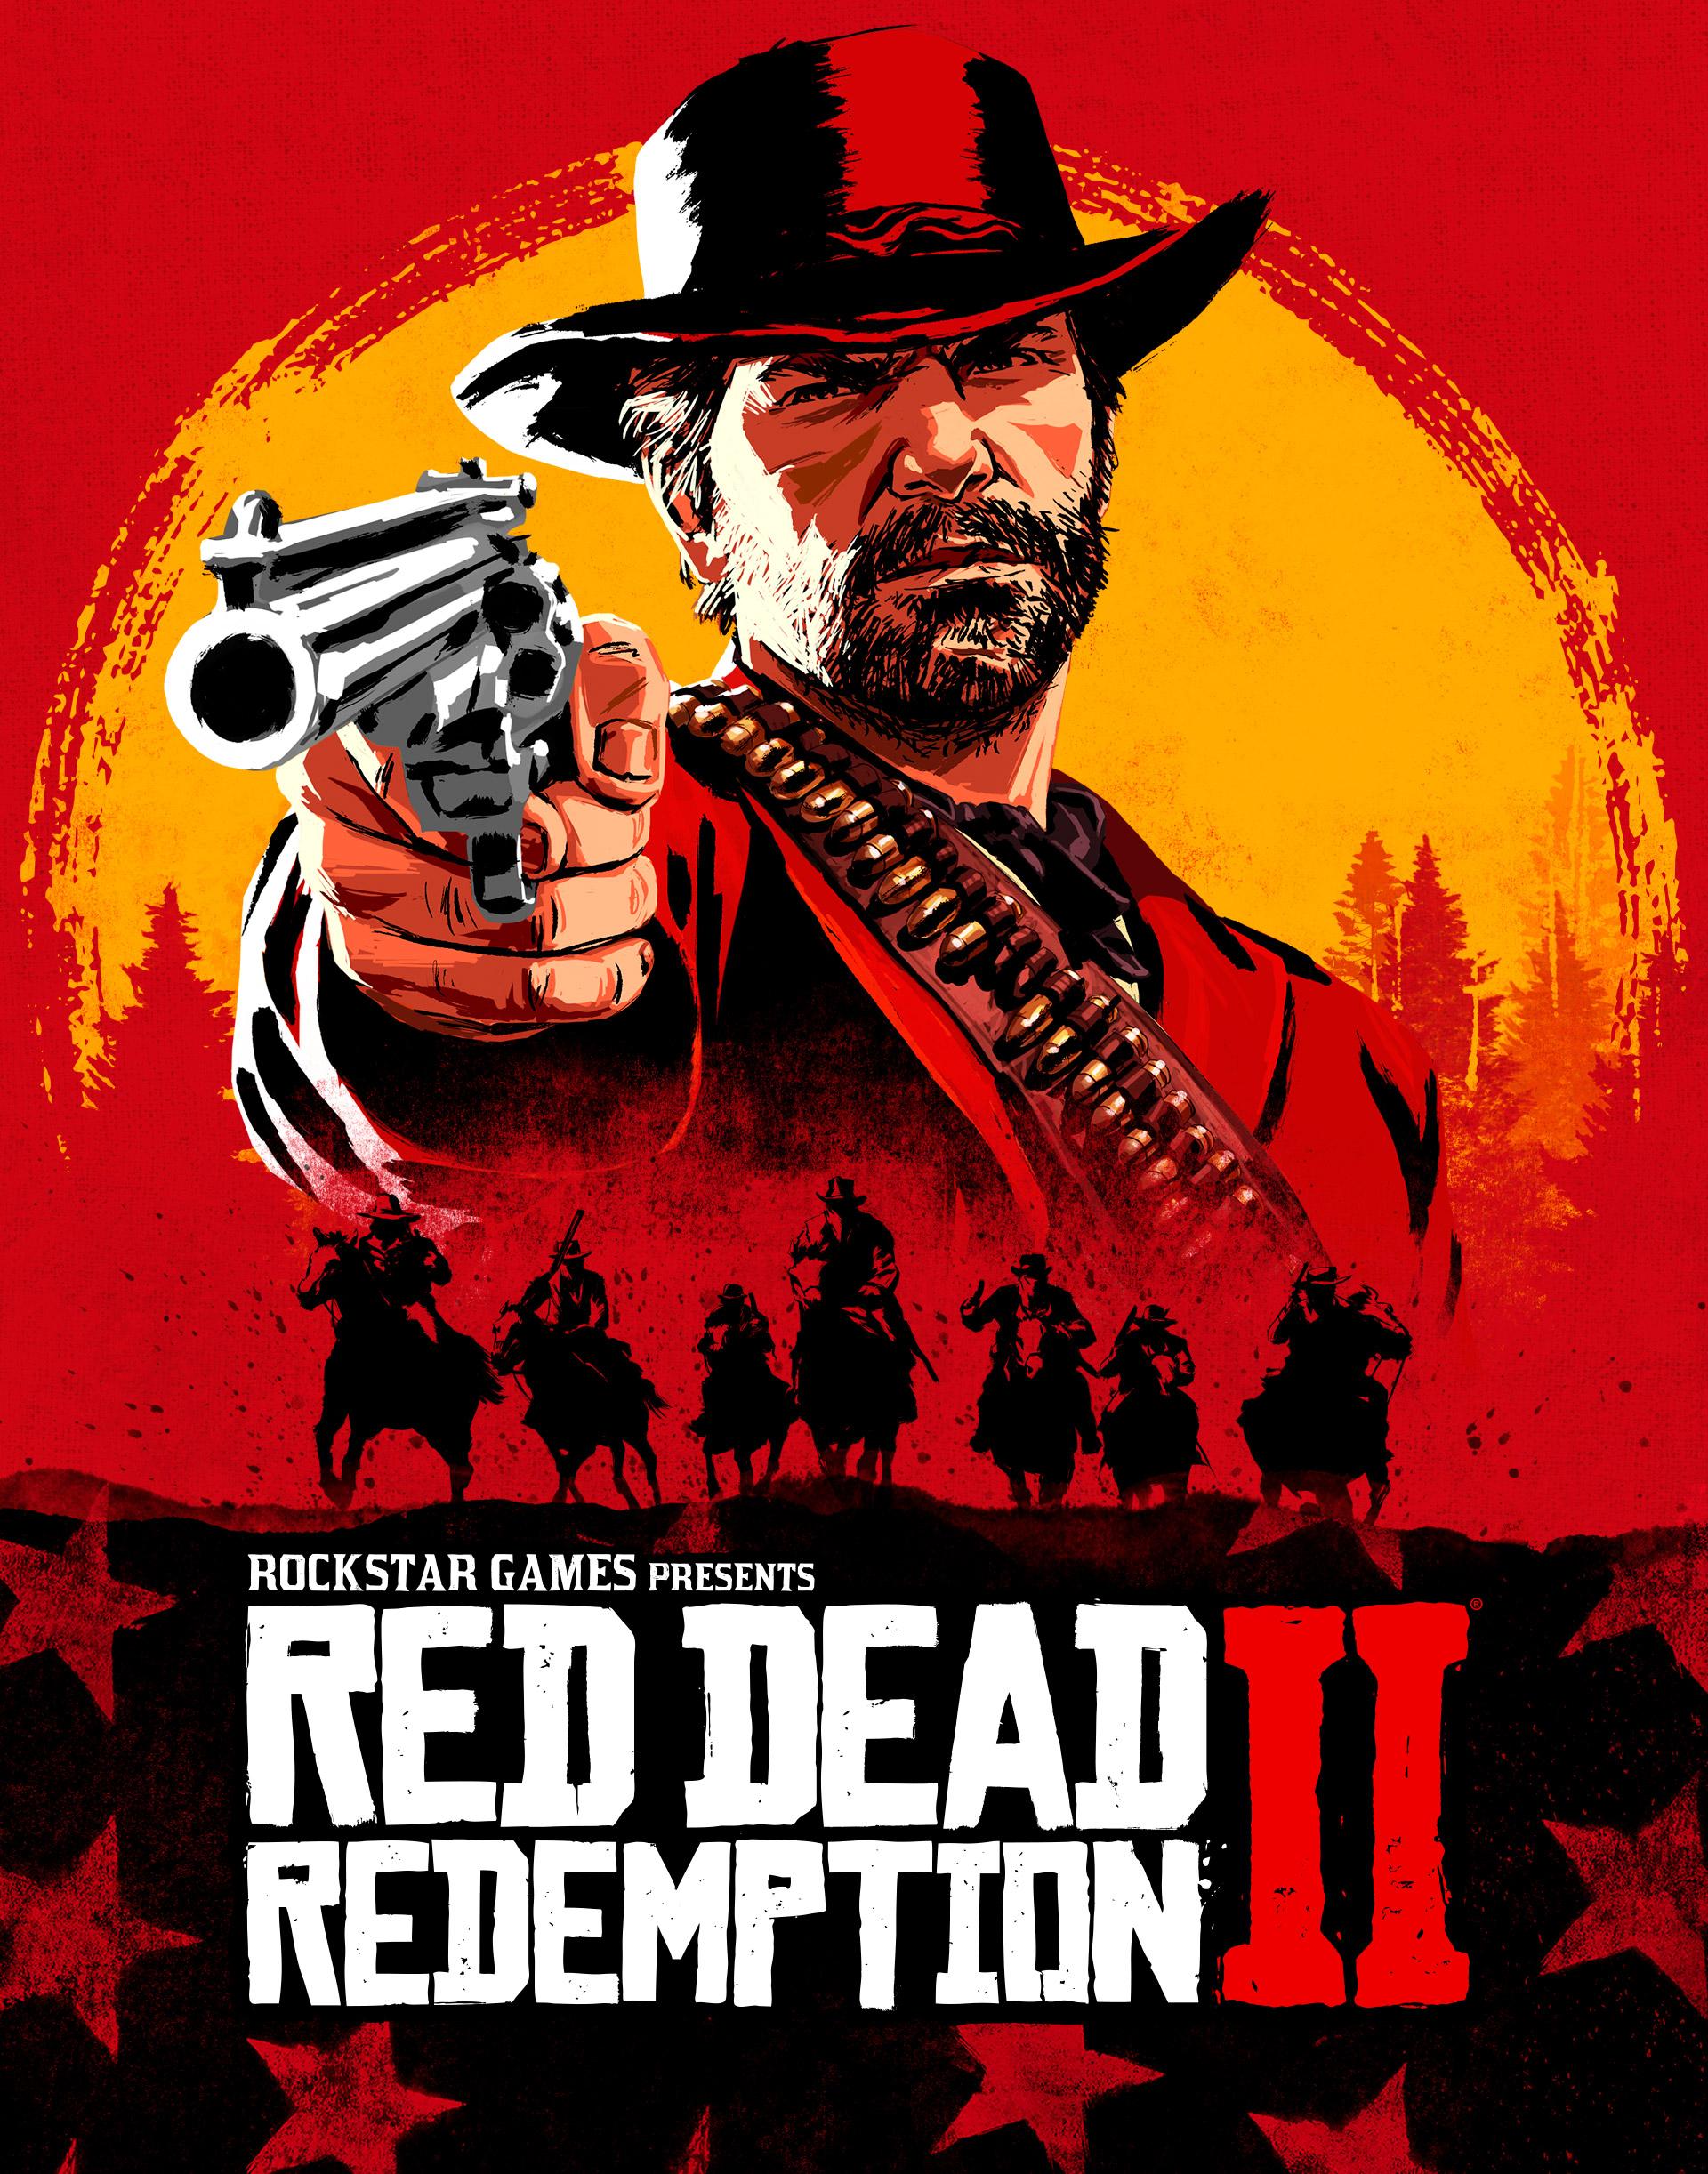 https://www.rockstargames.com/reddeadredemption2/dist/img/en_us/0b7957d72fb72a313fa84c0359054fd8.jpg